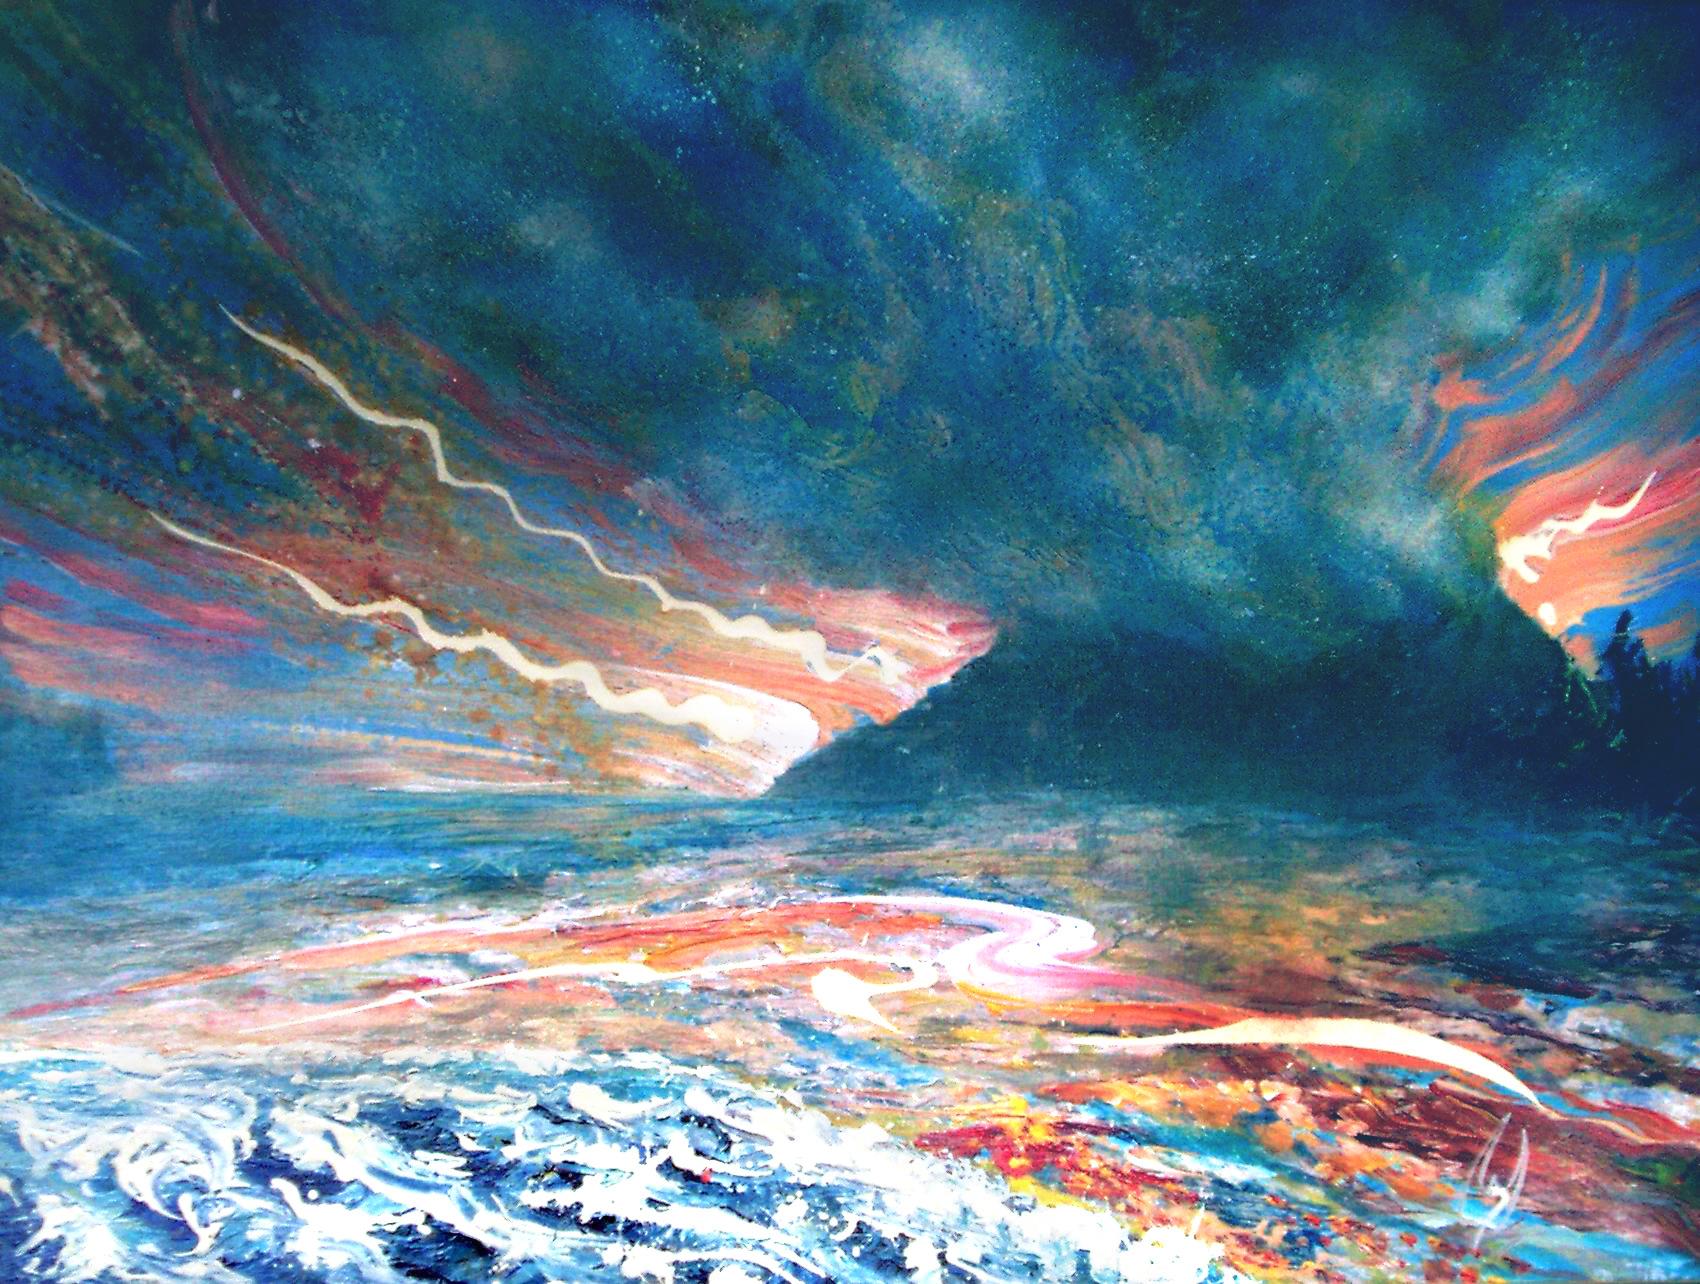 COSMIC CLOUD - 36 x 48, acrylic on canvas